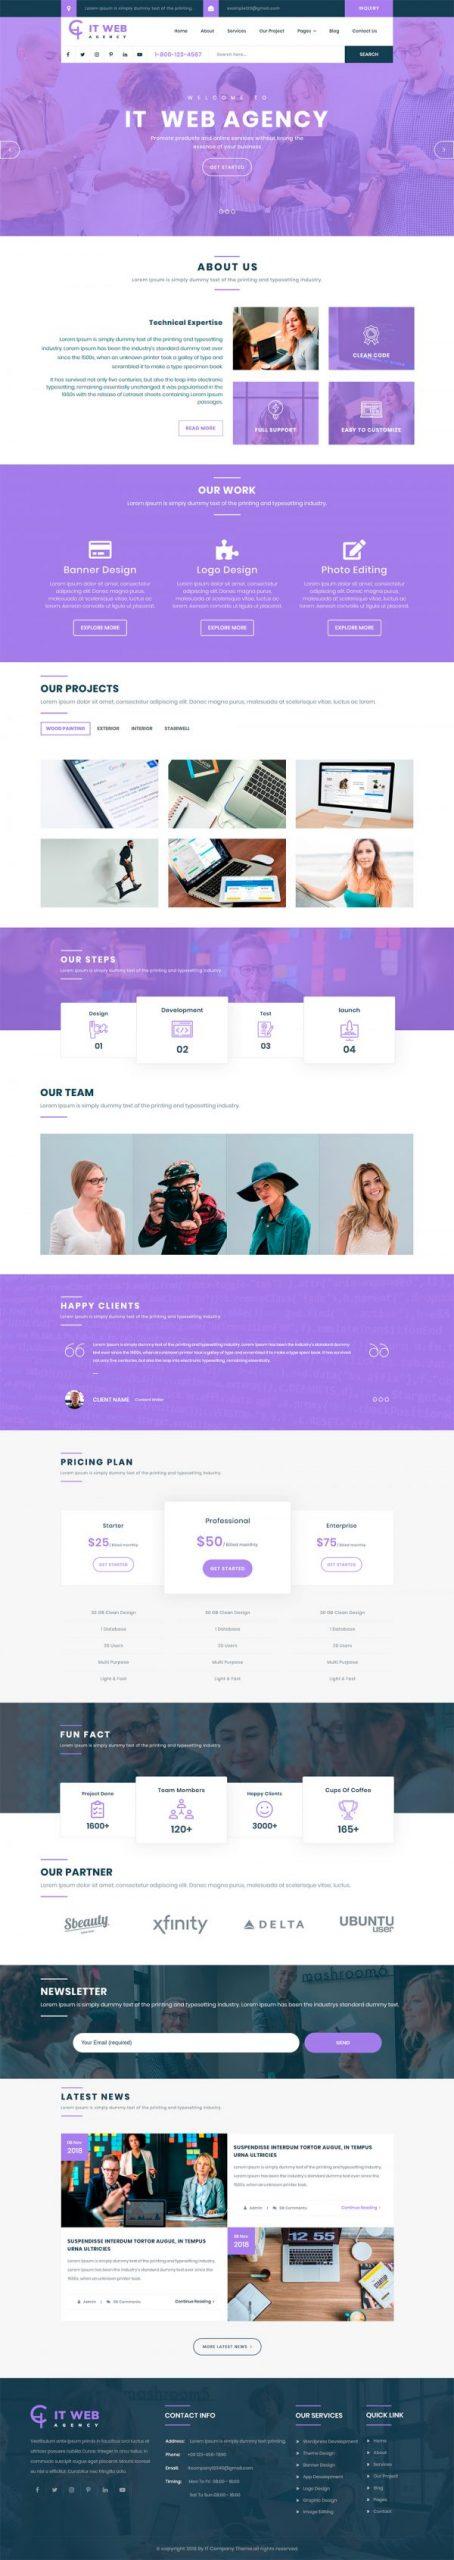 IT Company WordPress Template